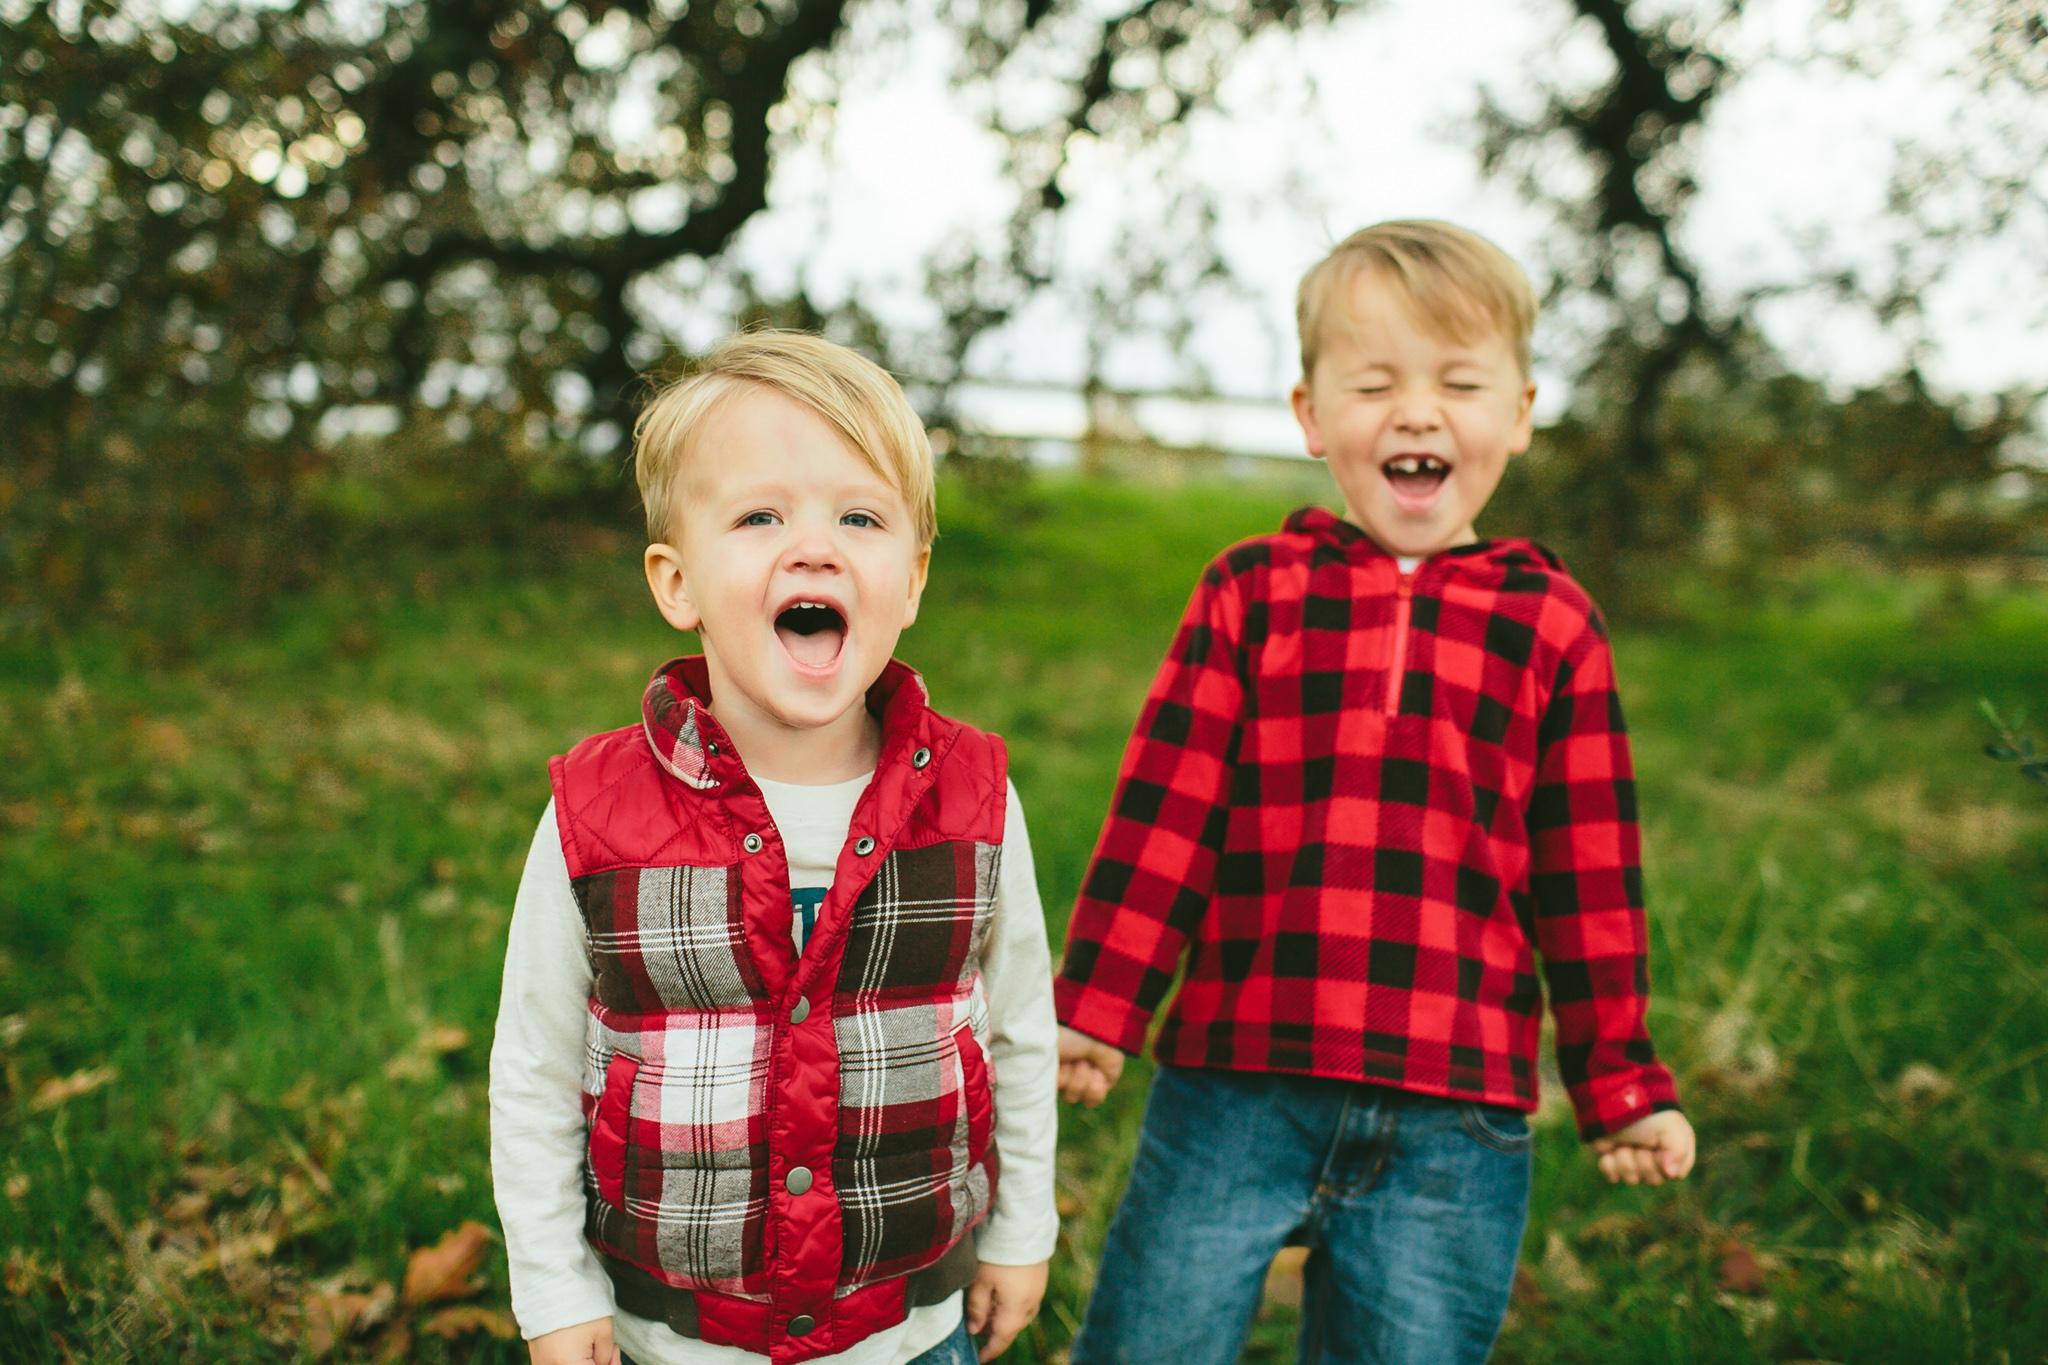 Christmas-Photos_2015-KellyBoitanoPhotography_WEB20151215_0141